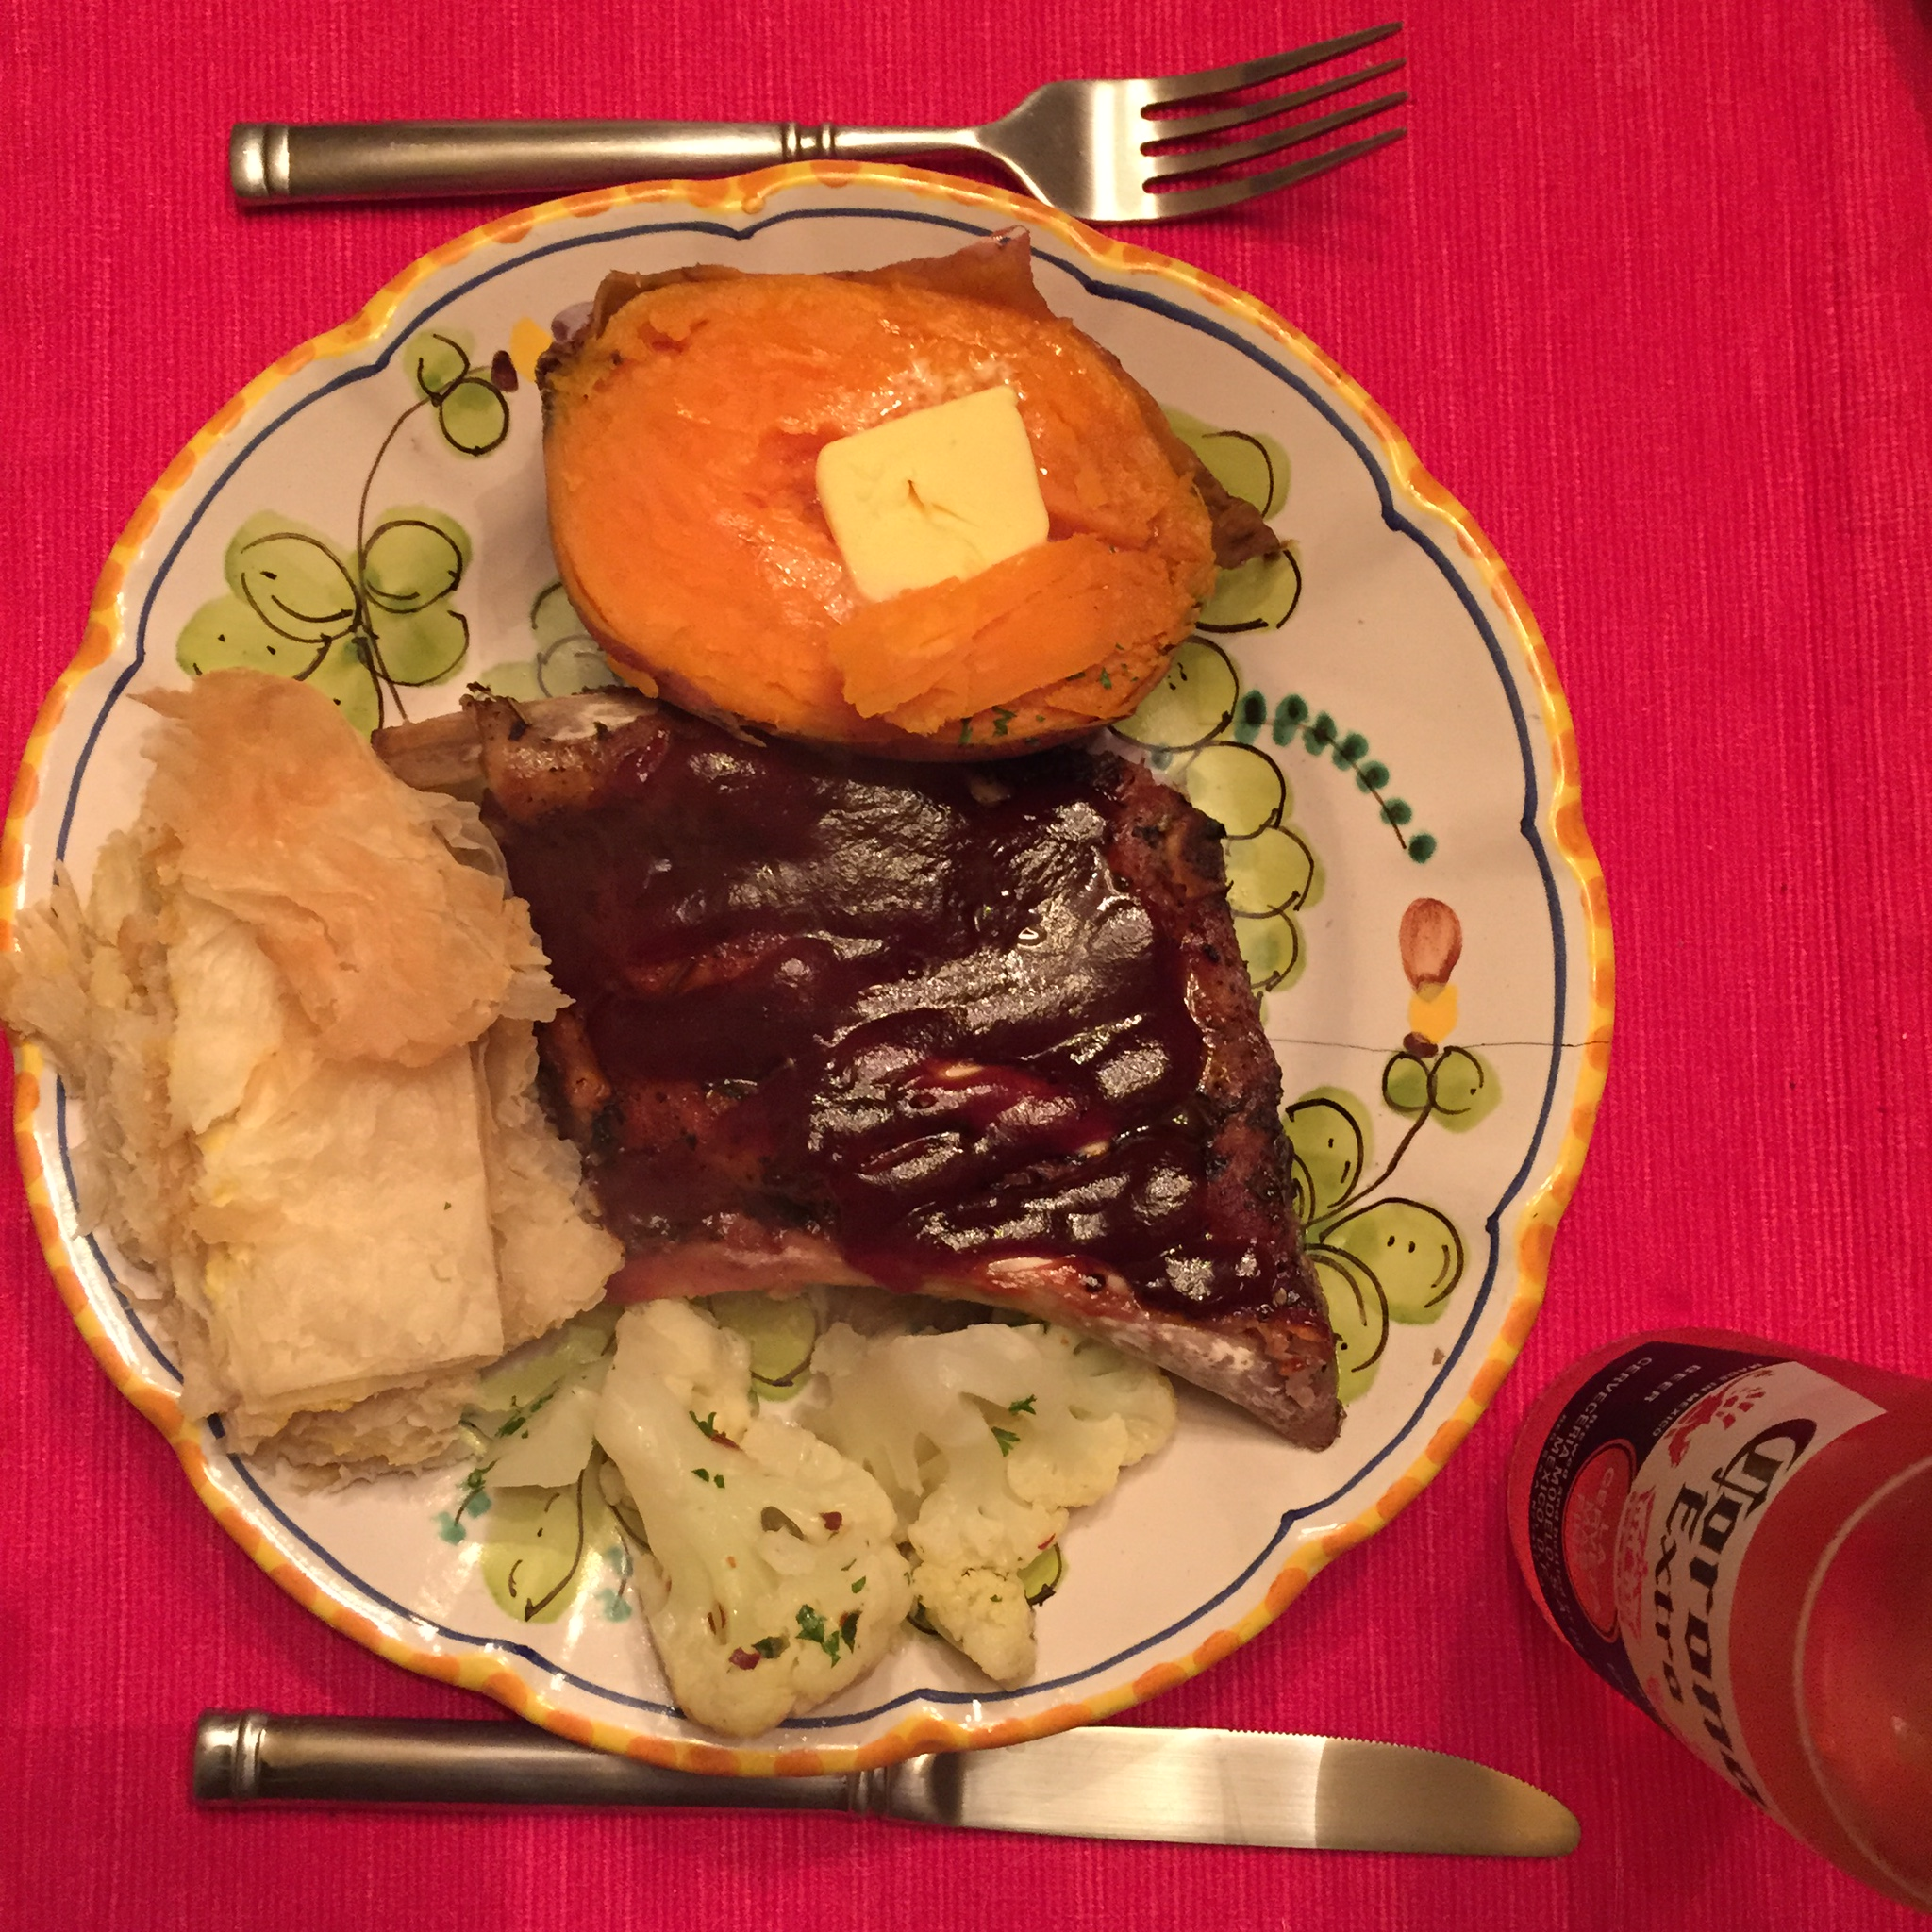 Slow Roasted Ribs, Yams, Pumpkin Byrek and Cauliflower